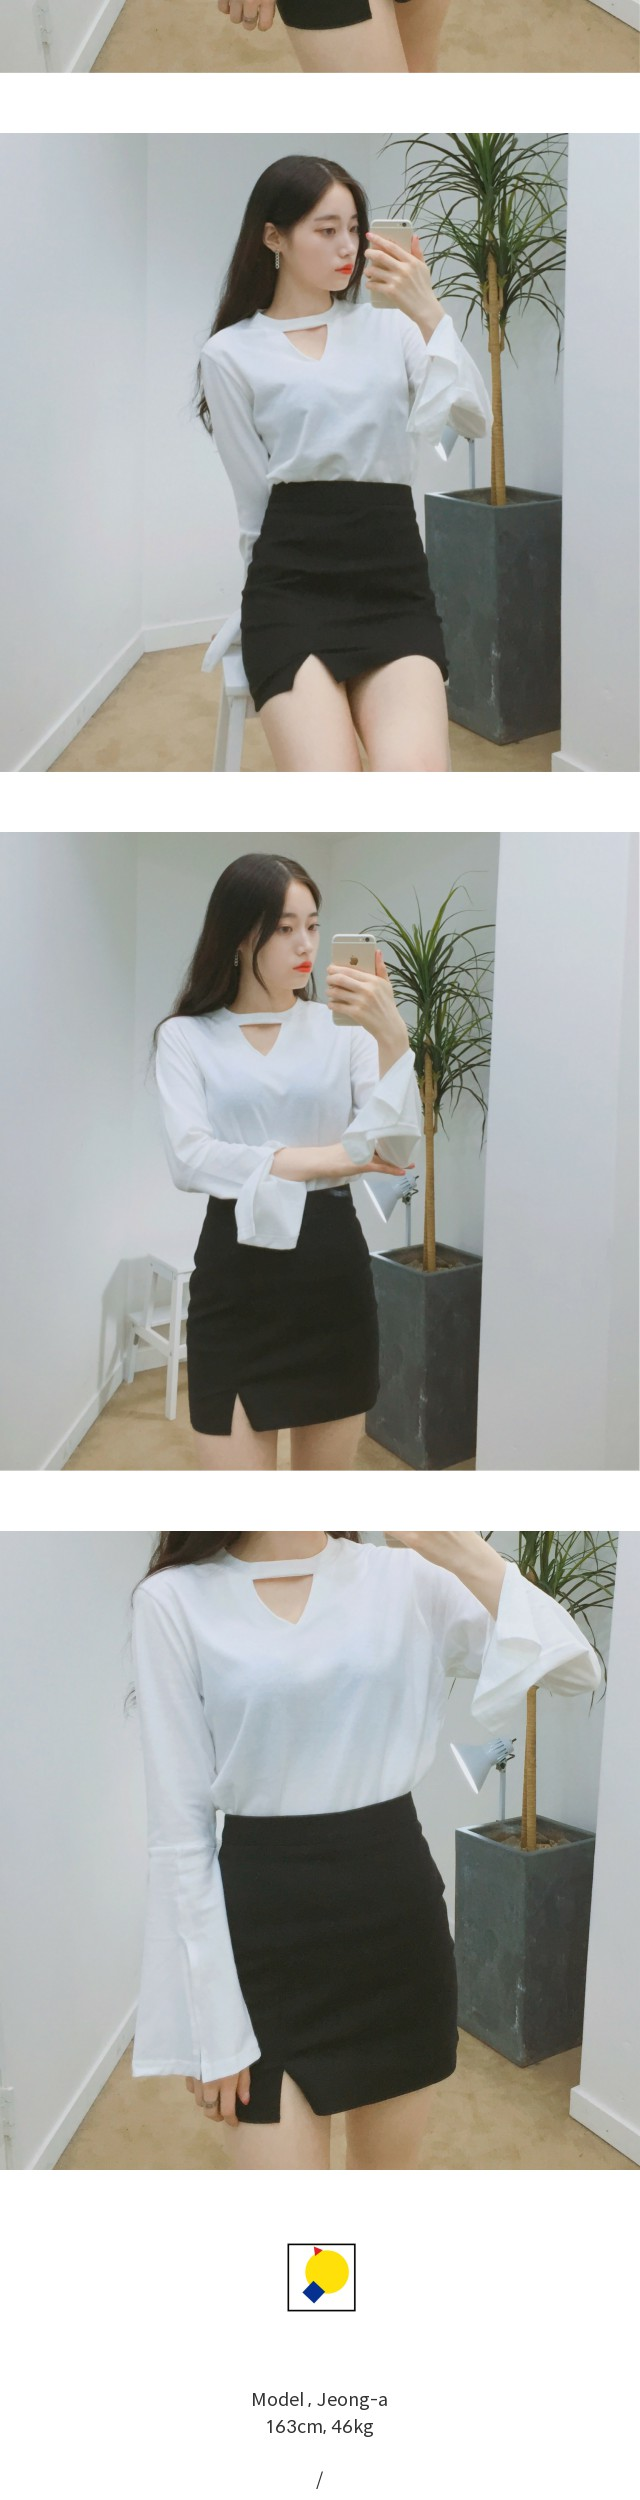 Remit skirt